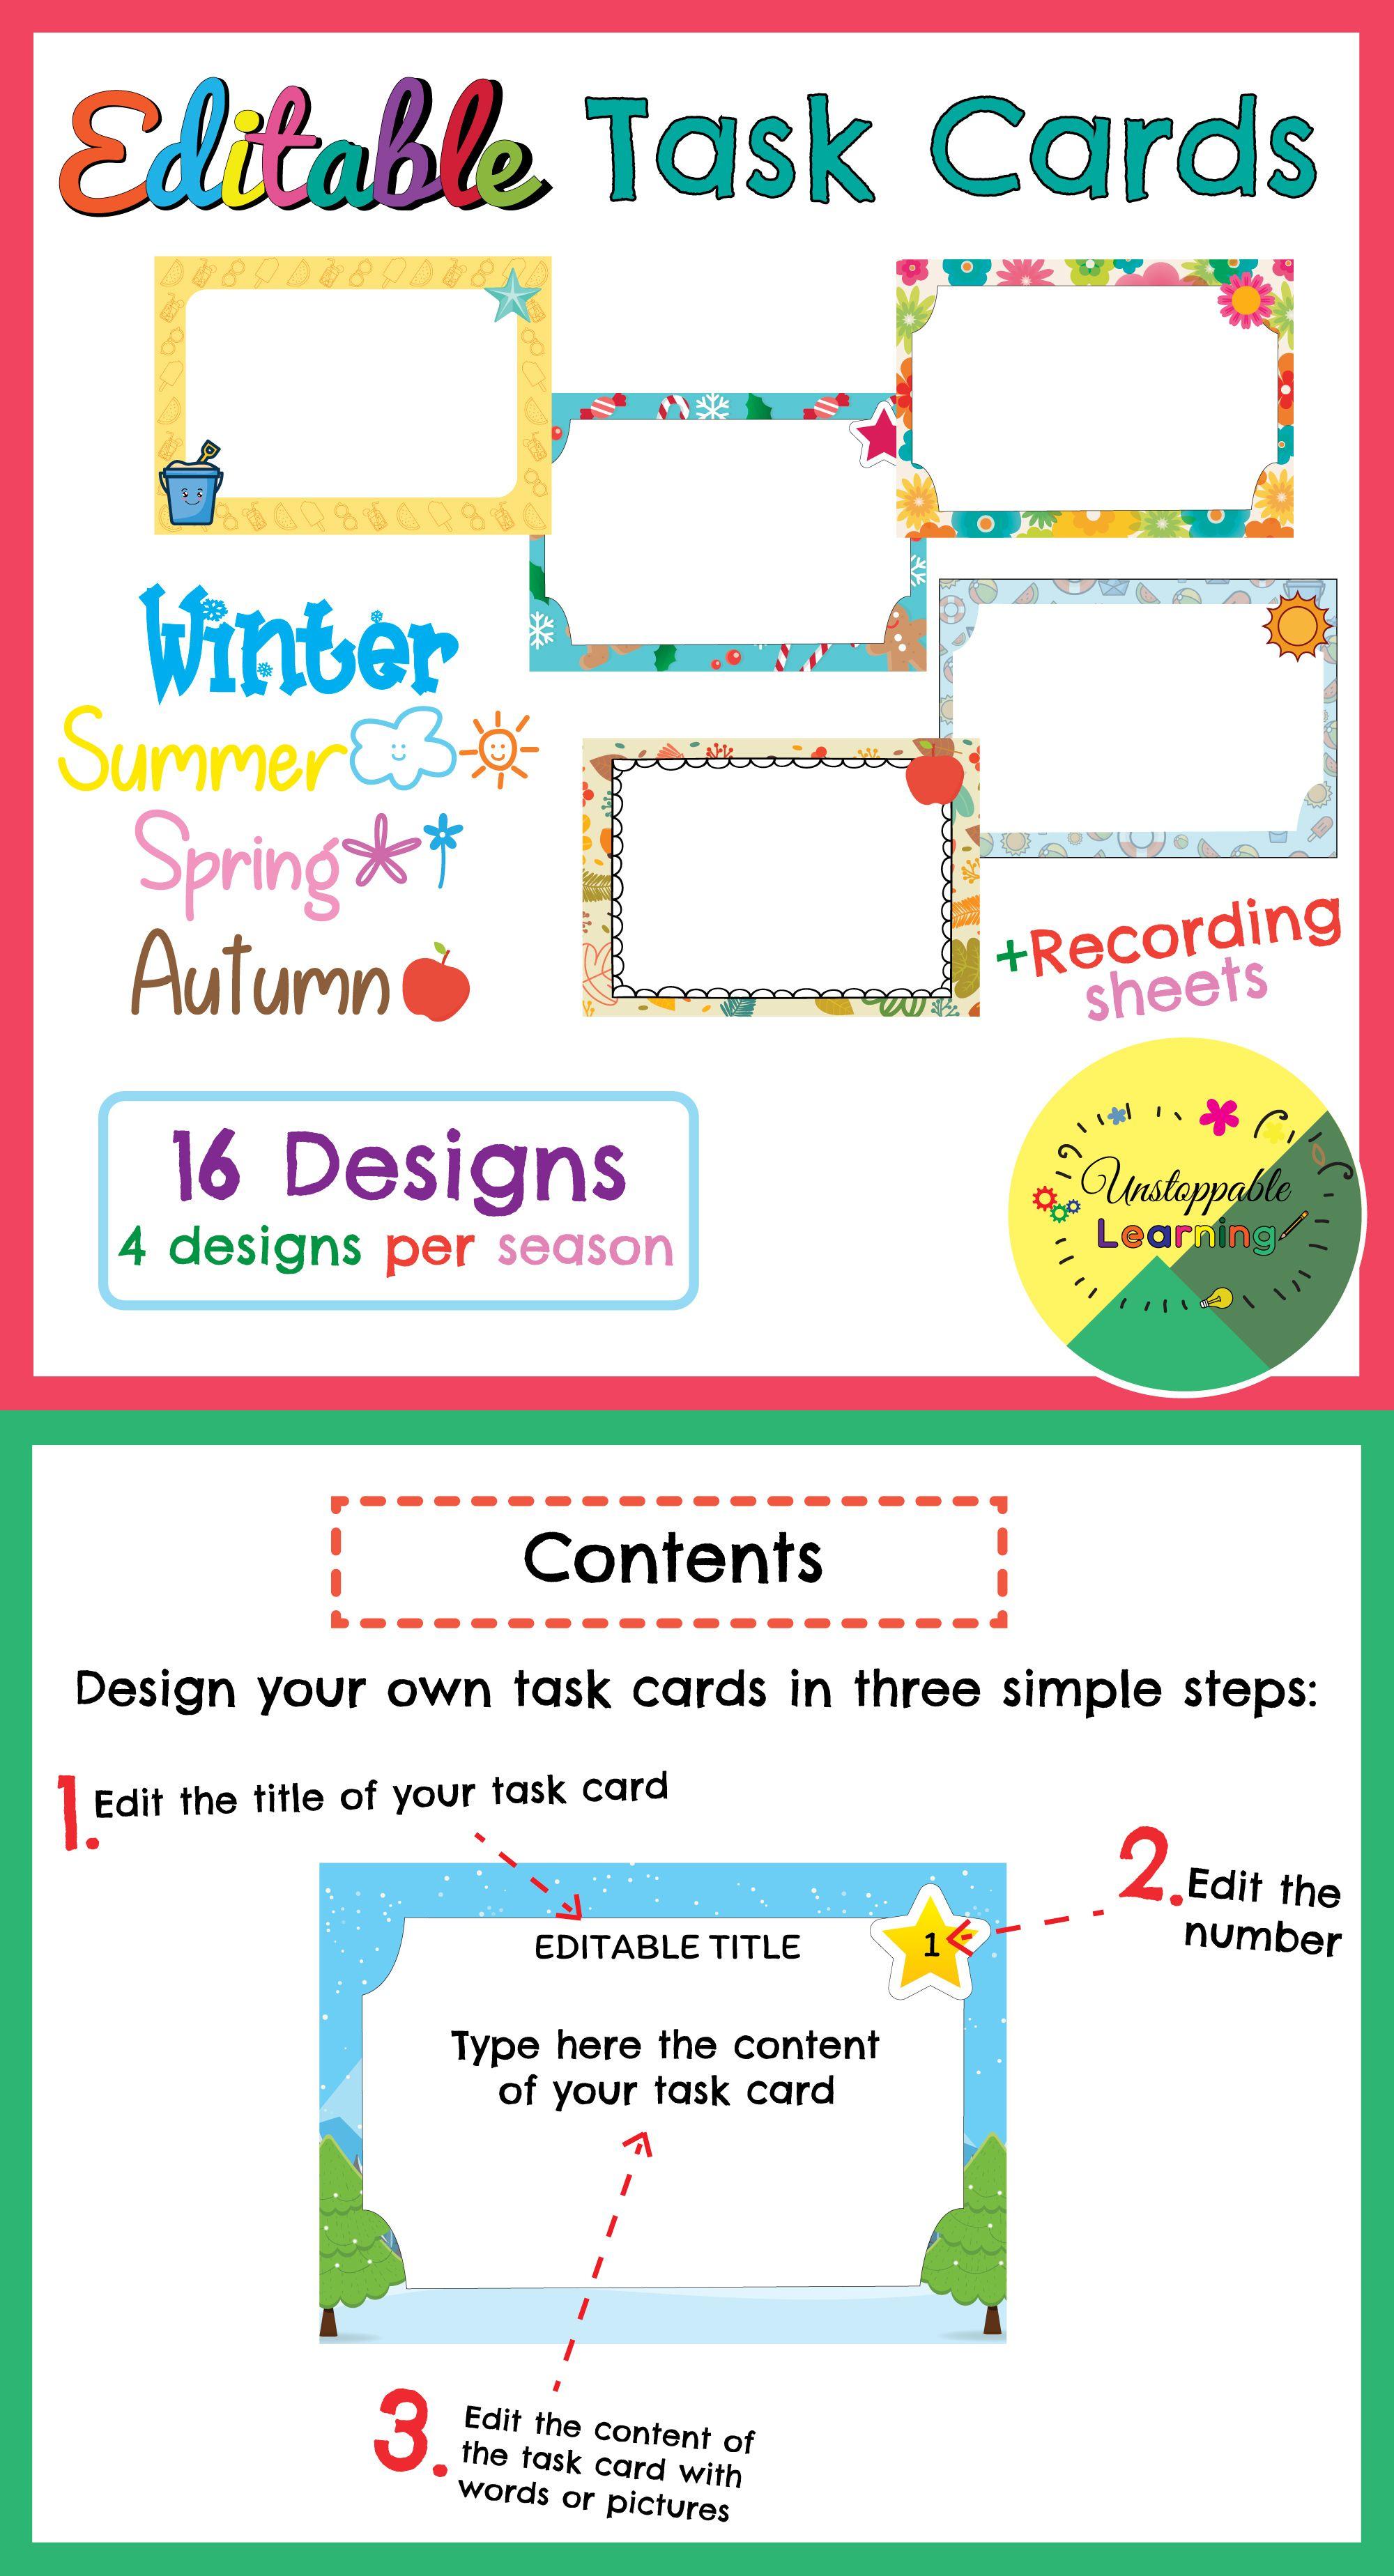 Editable Task Card Templates Seasonal Themed Task Cards Card Template Business Plan Template